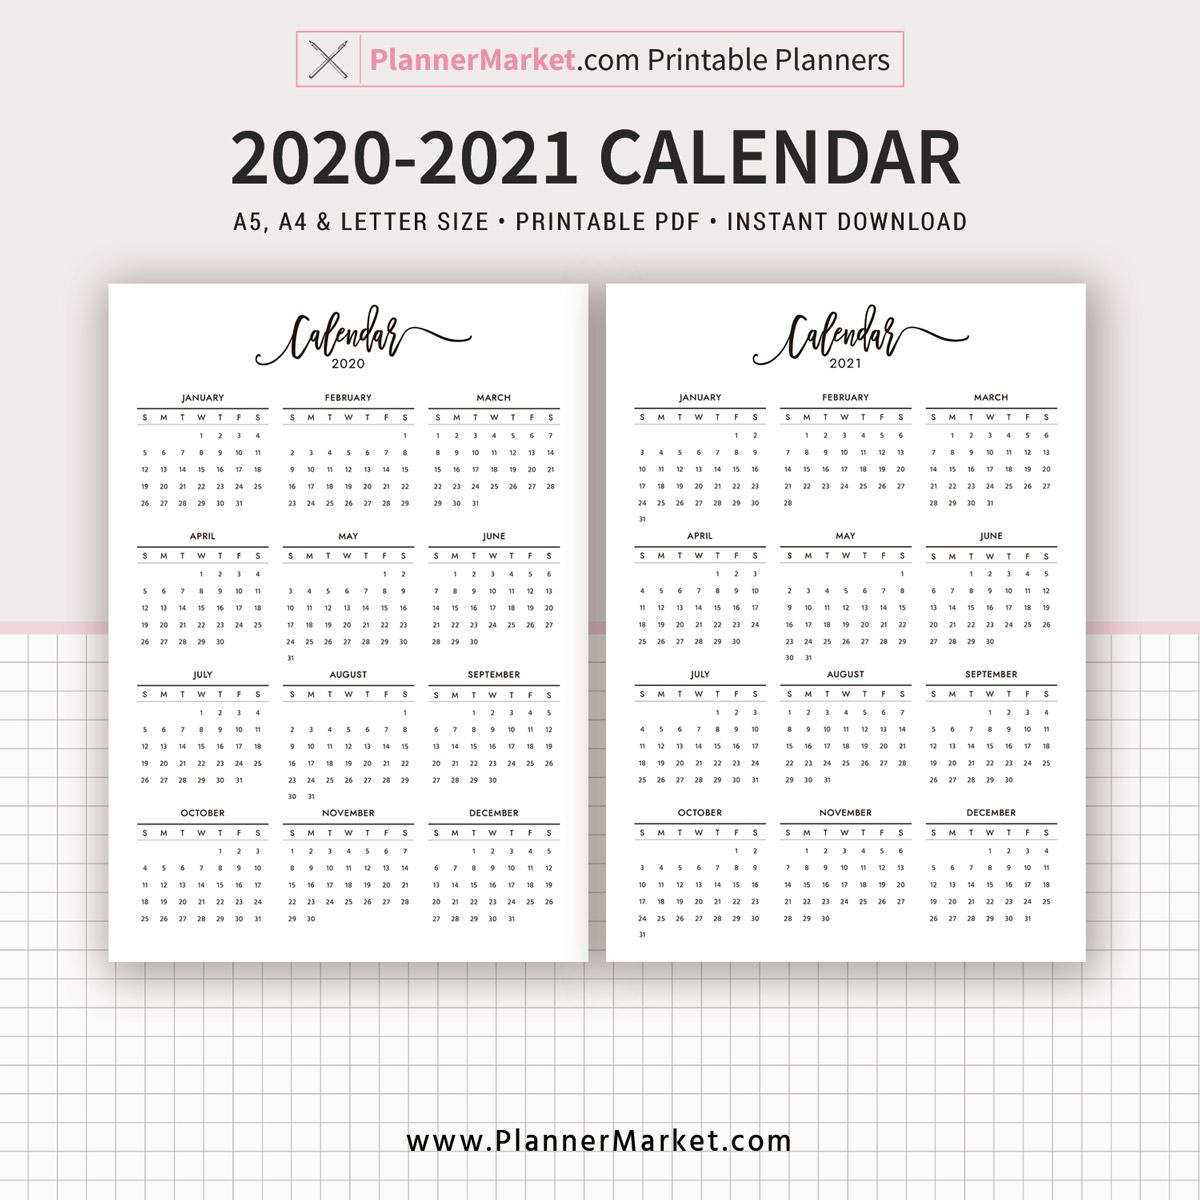 2020-2021 Calendar Printable, Year At A Glance, Filofax A5